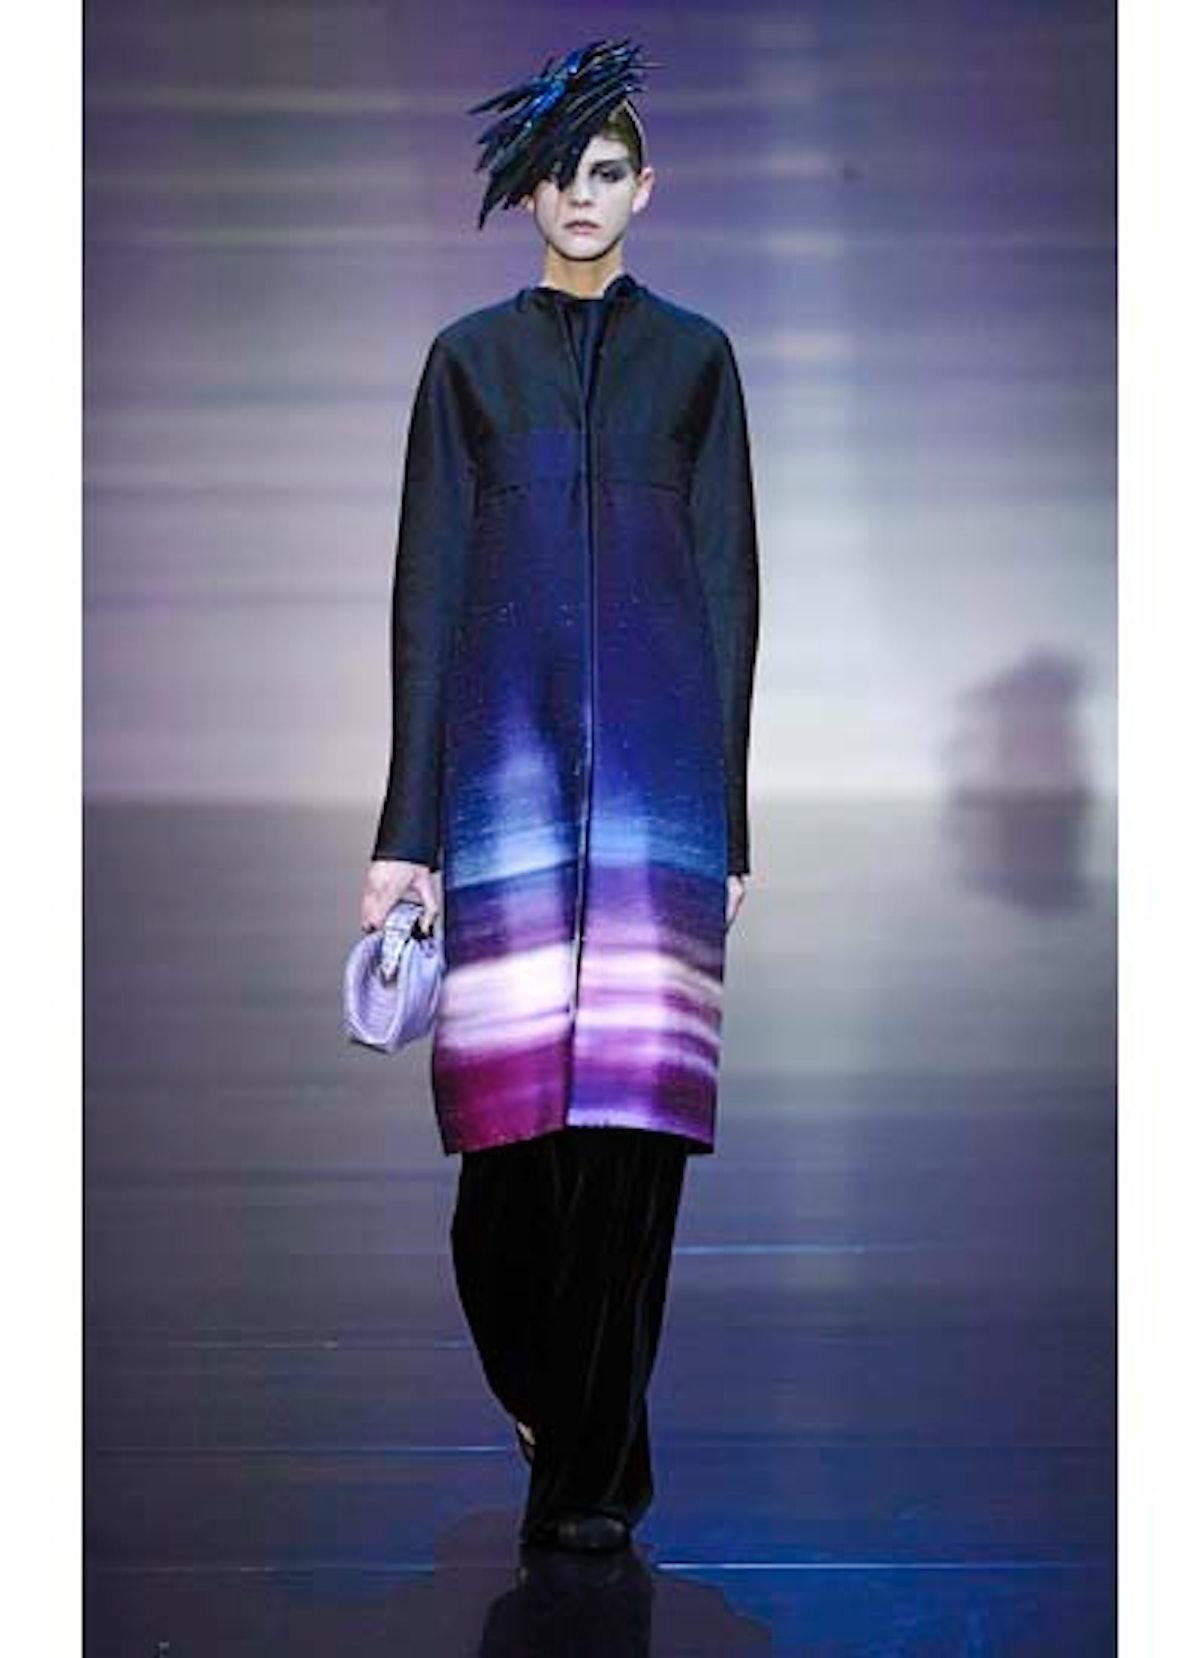 fass-giorgio-armani-couture-2012-runway-23-v.jpg